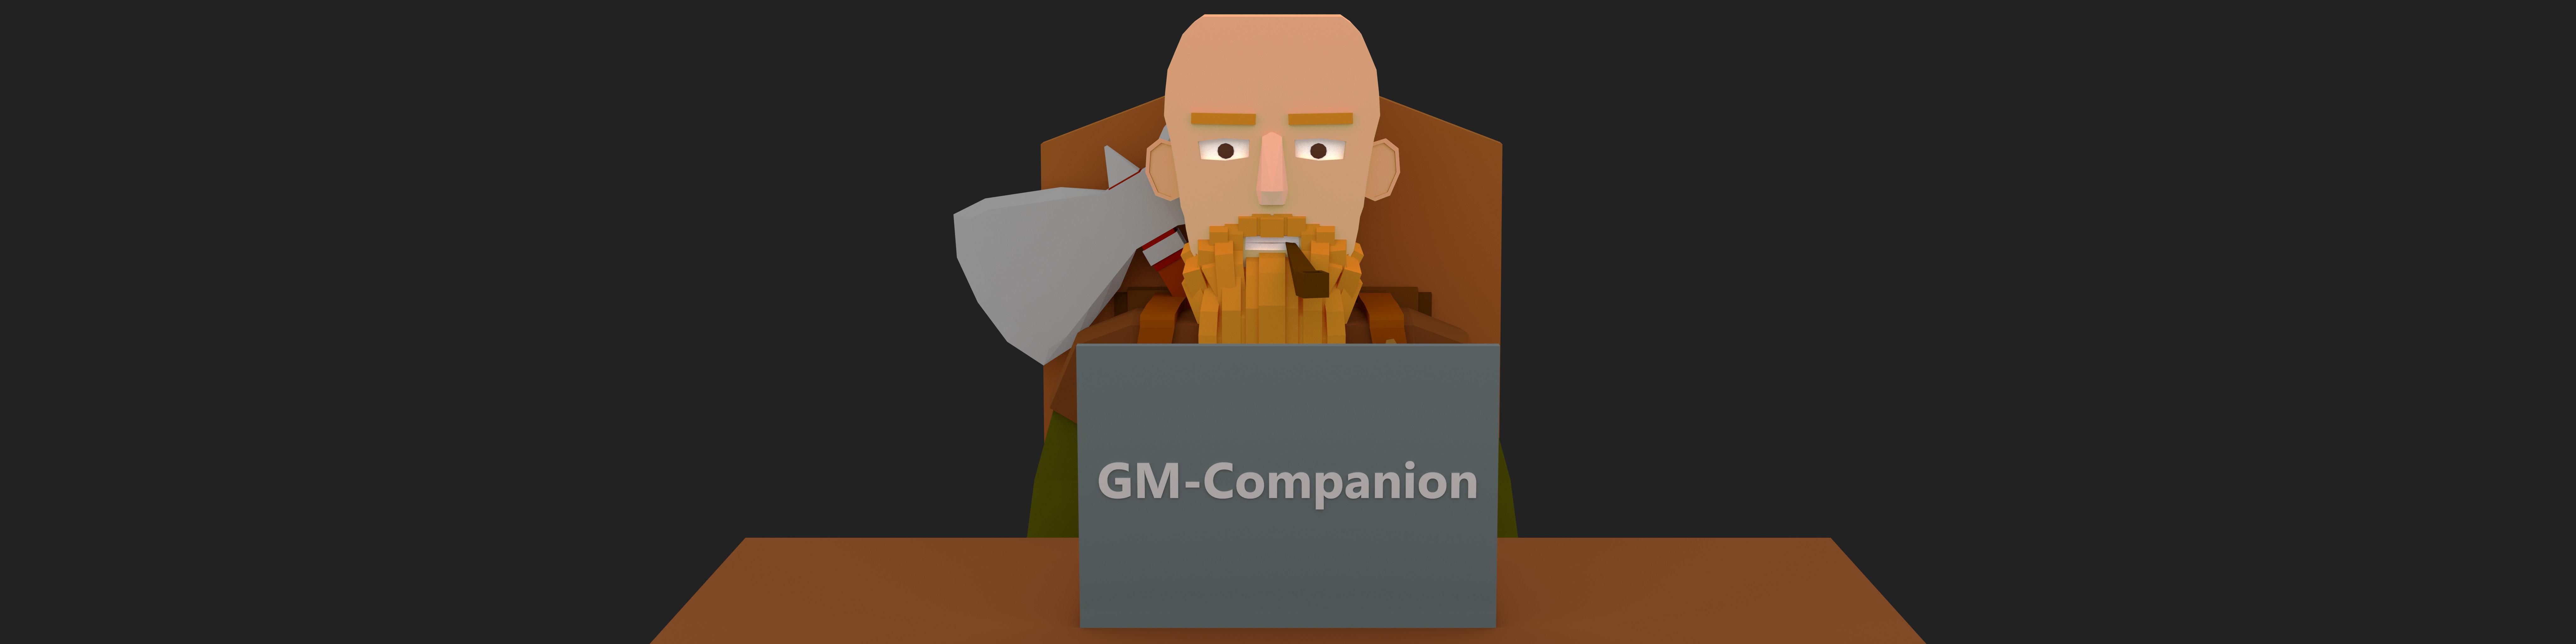 GM-Companion